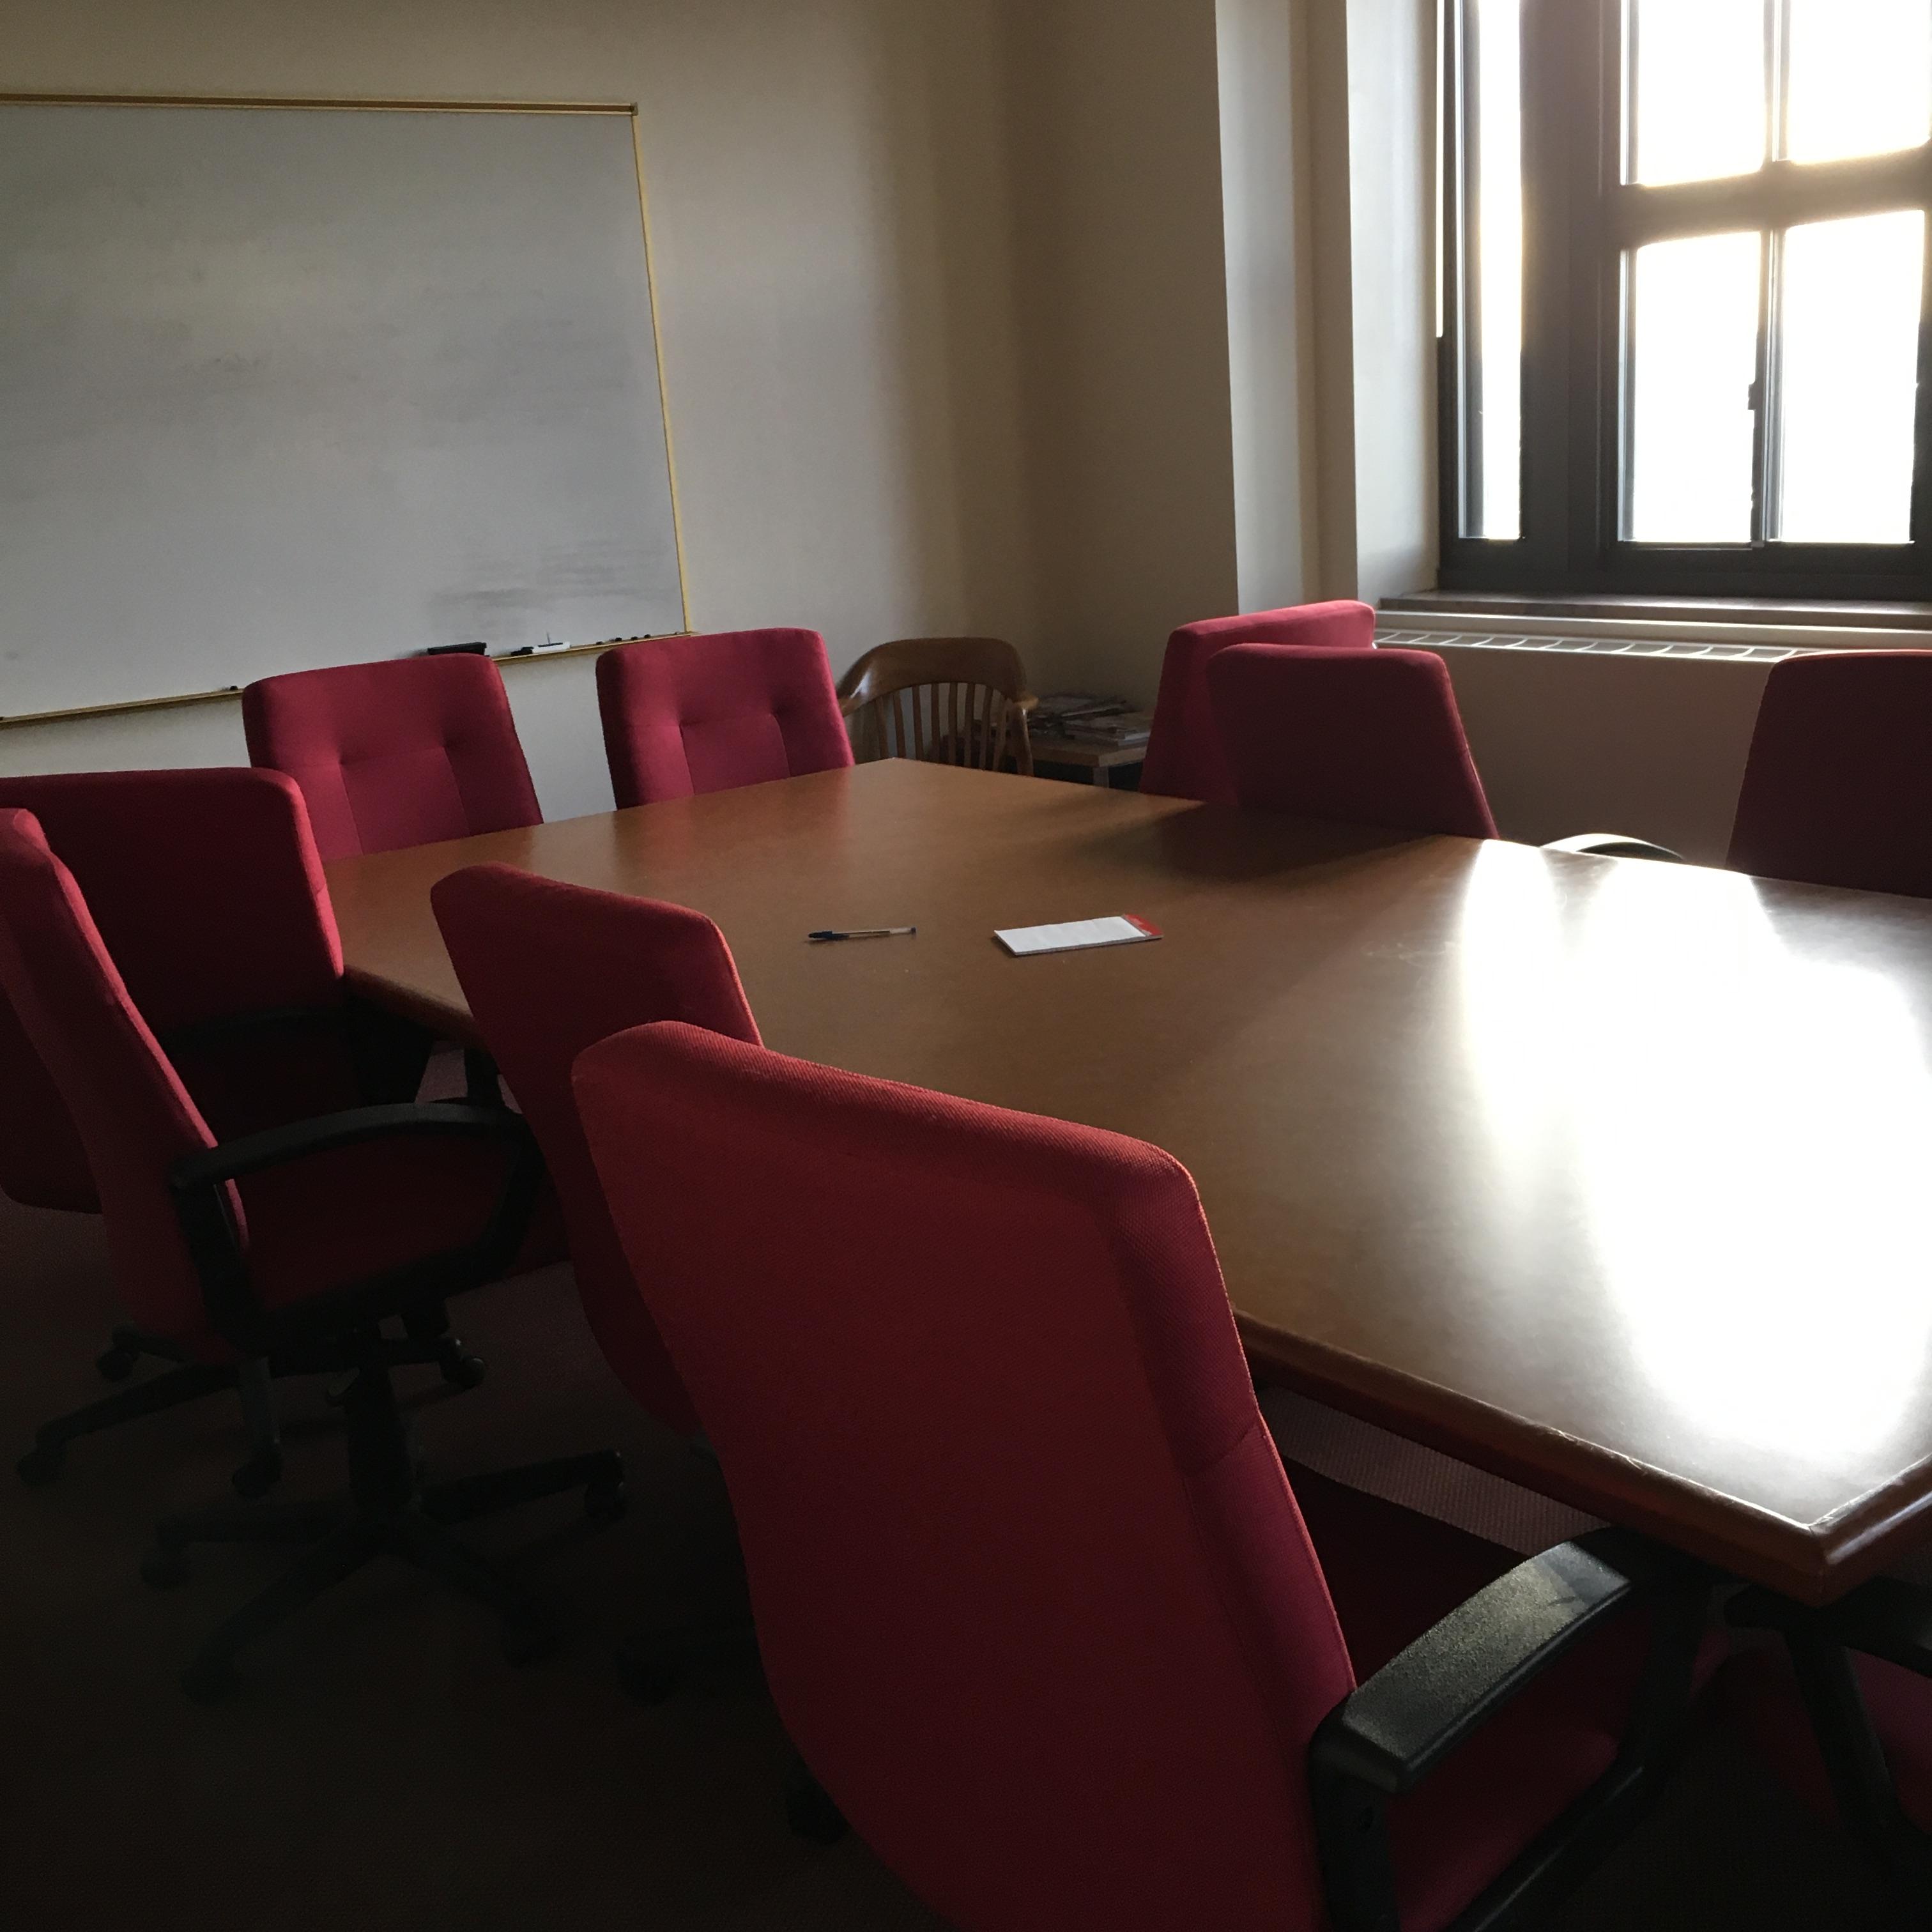 Jury Deliberation Room